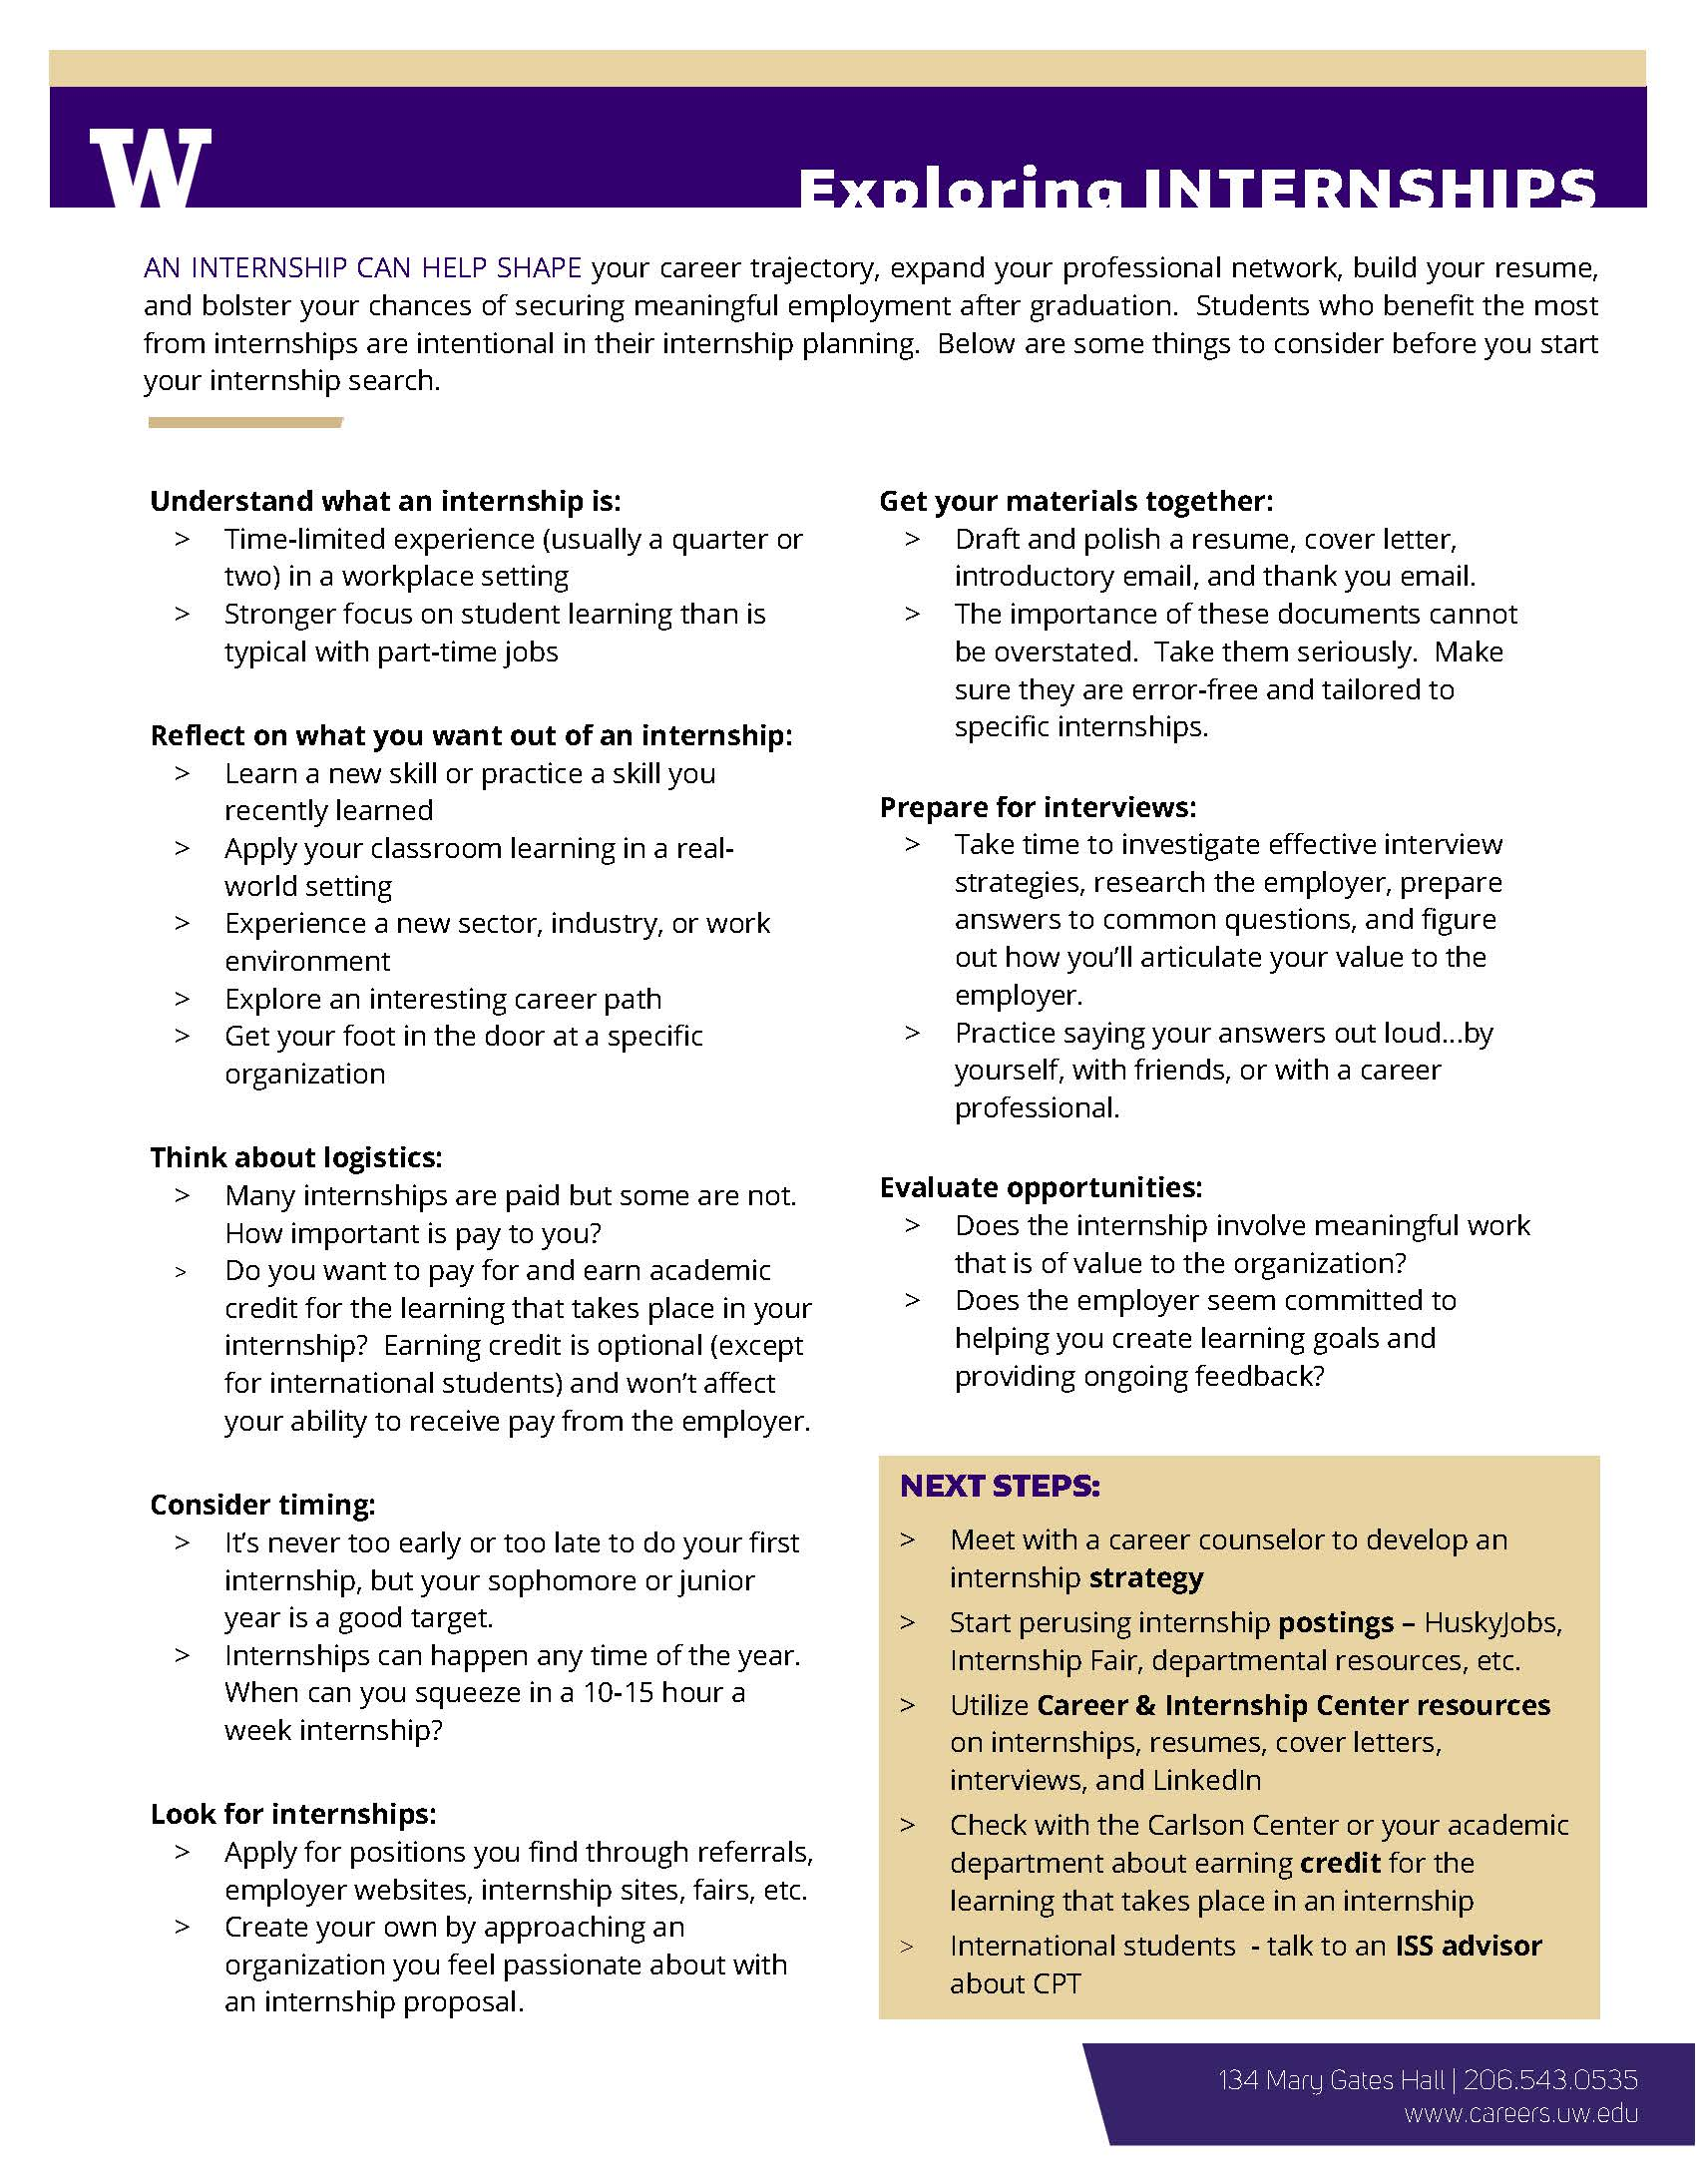 resume for biotech internship profesional resume for job resume for biotech internship labrat internship corner career and internship center university of